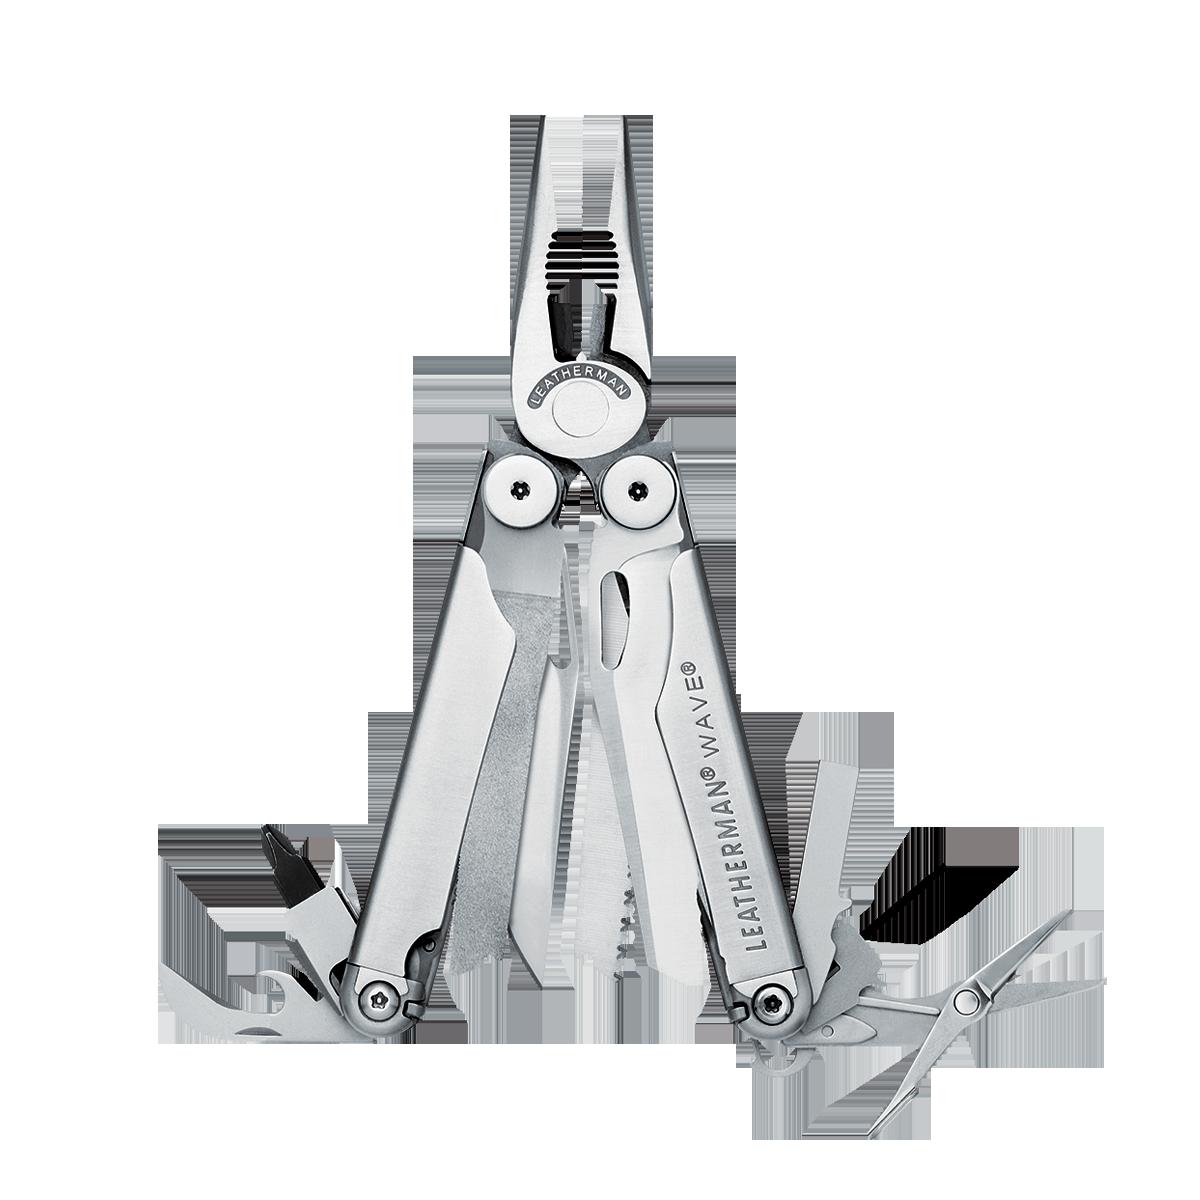 Wave 17-in-1 Multi-Tool   Leatherman